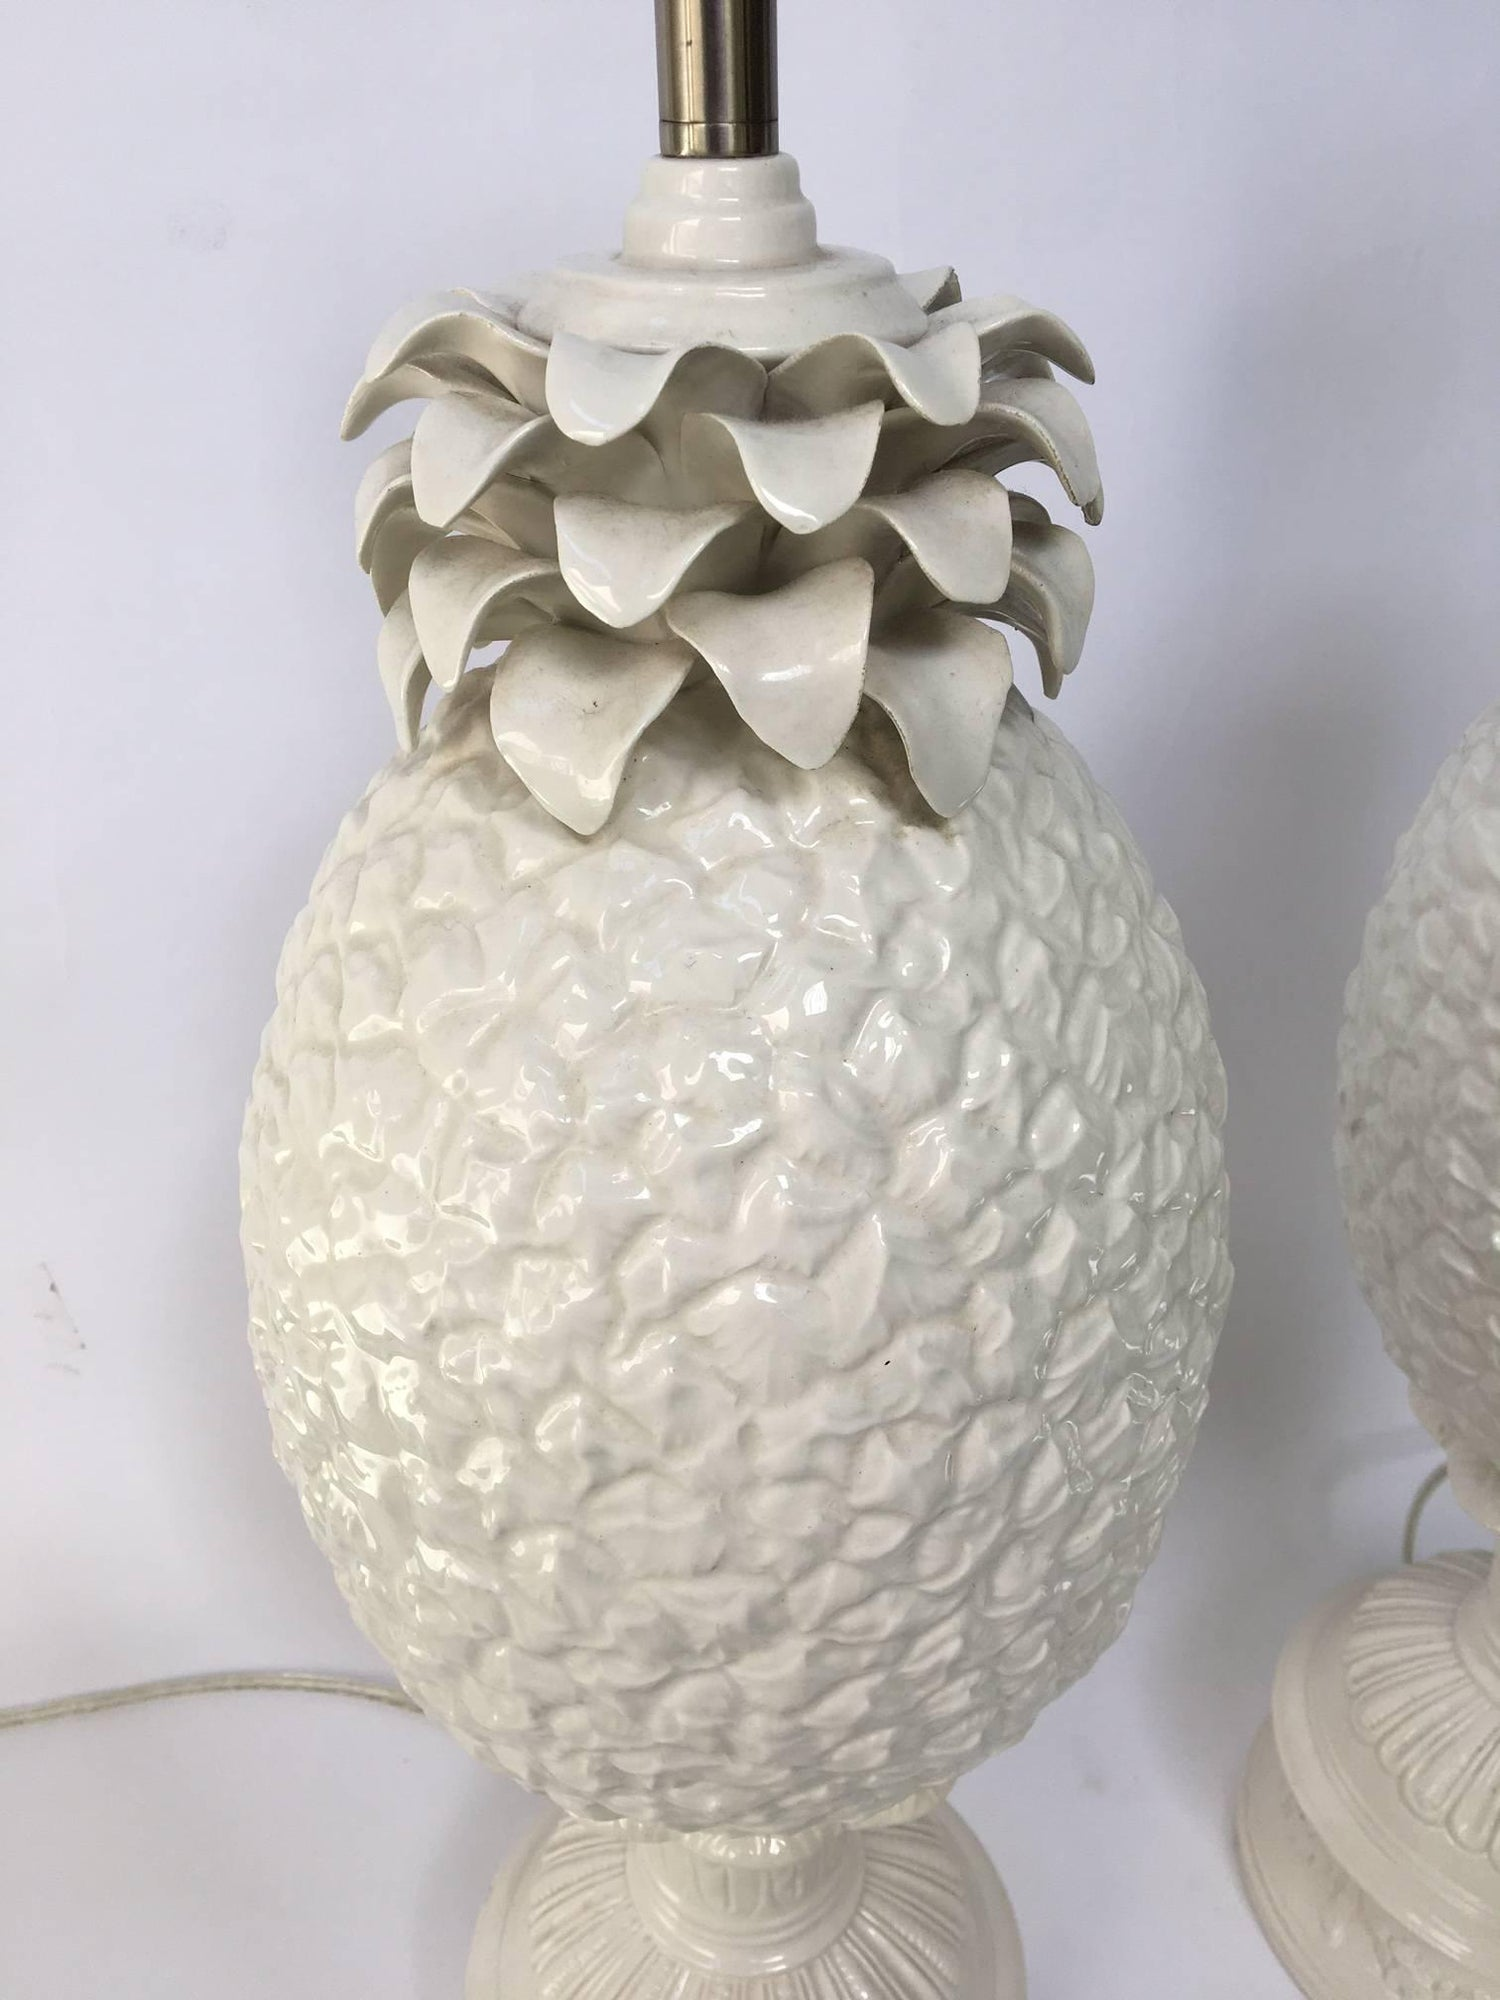 table lighting reviews quinn lamp pineapple ceramic finch pdx everly wayfair